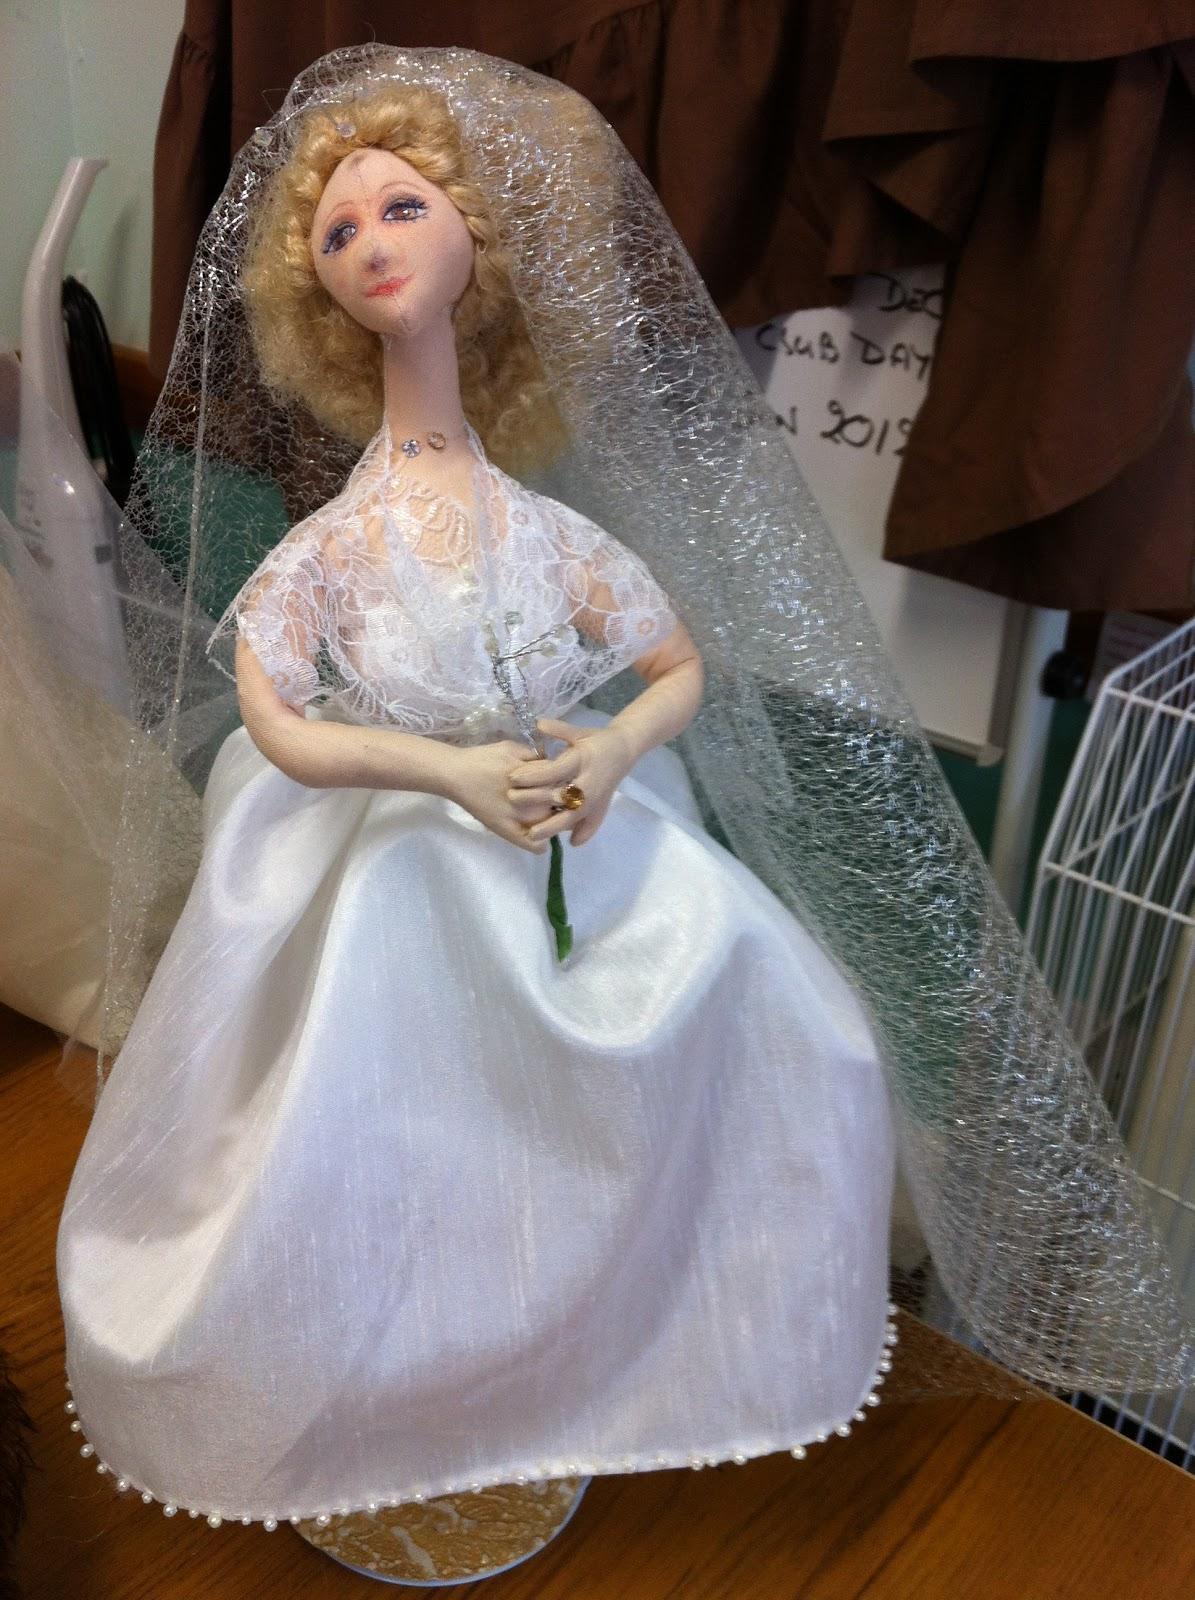 Fanciful Figures Doll Club 2011